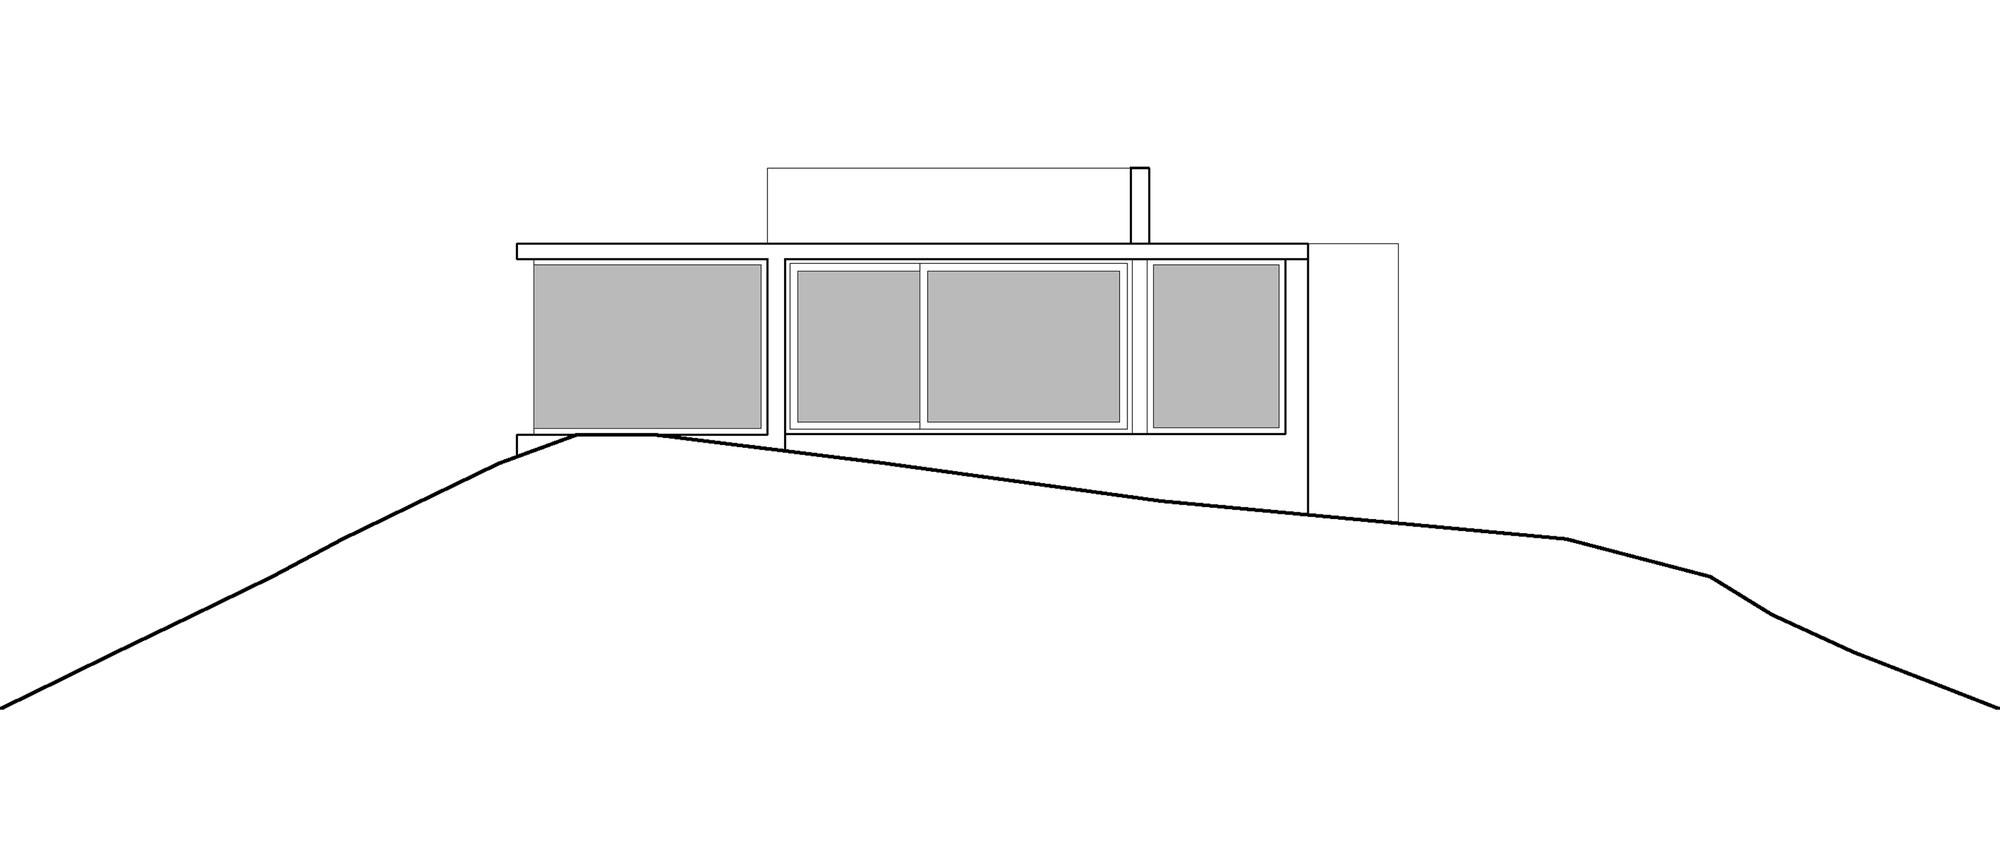 Wein House by Besonias Almeida Arquitectos-18